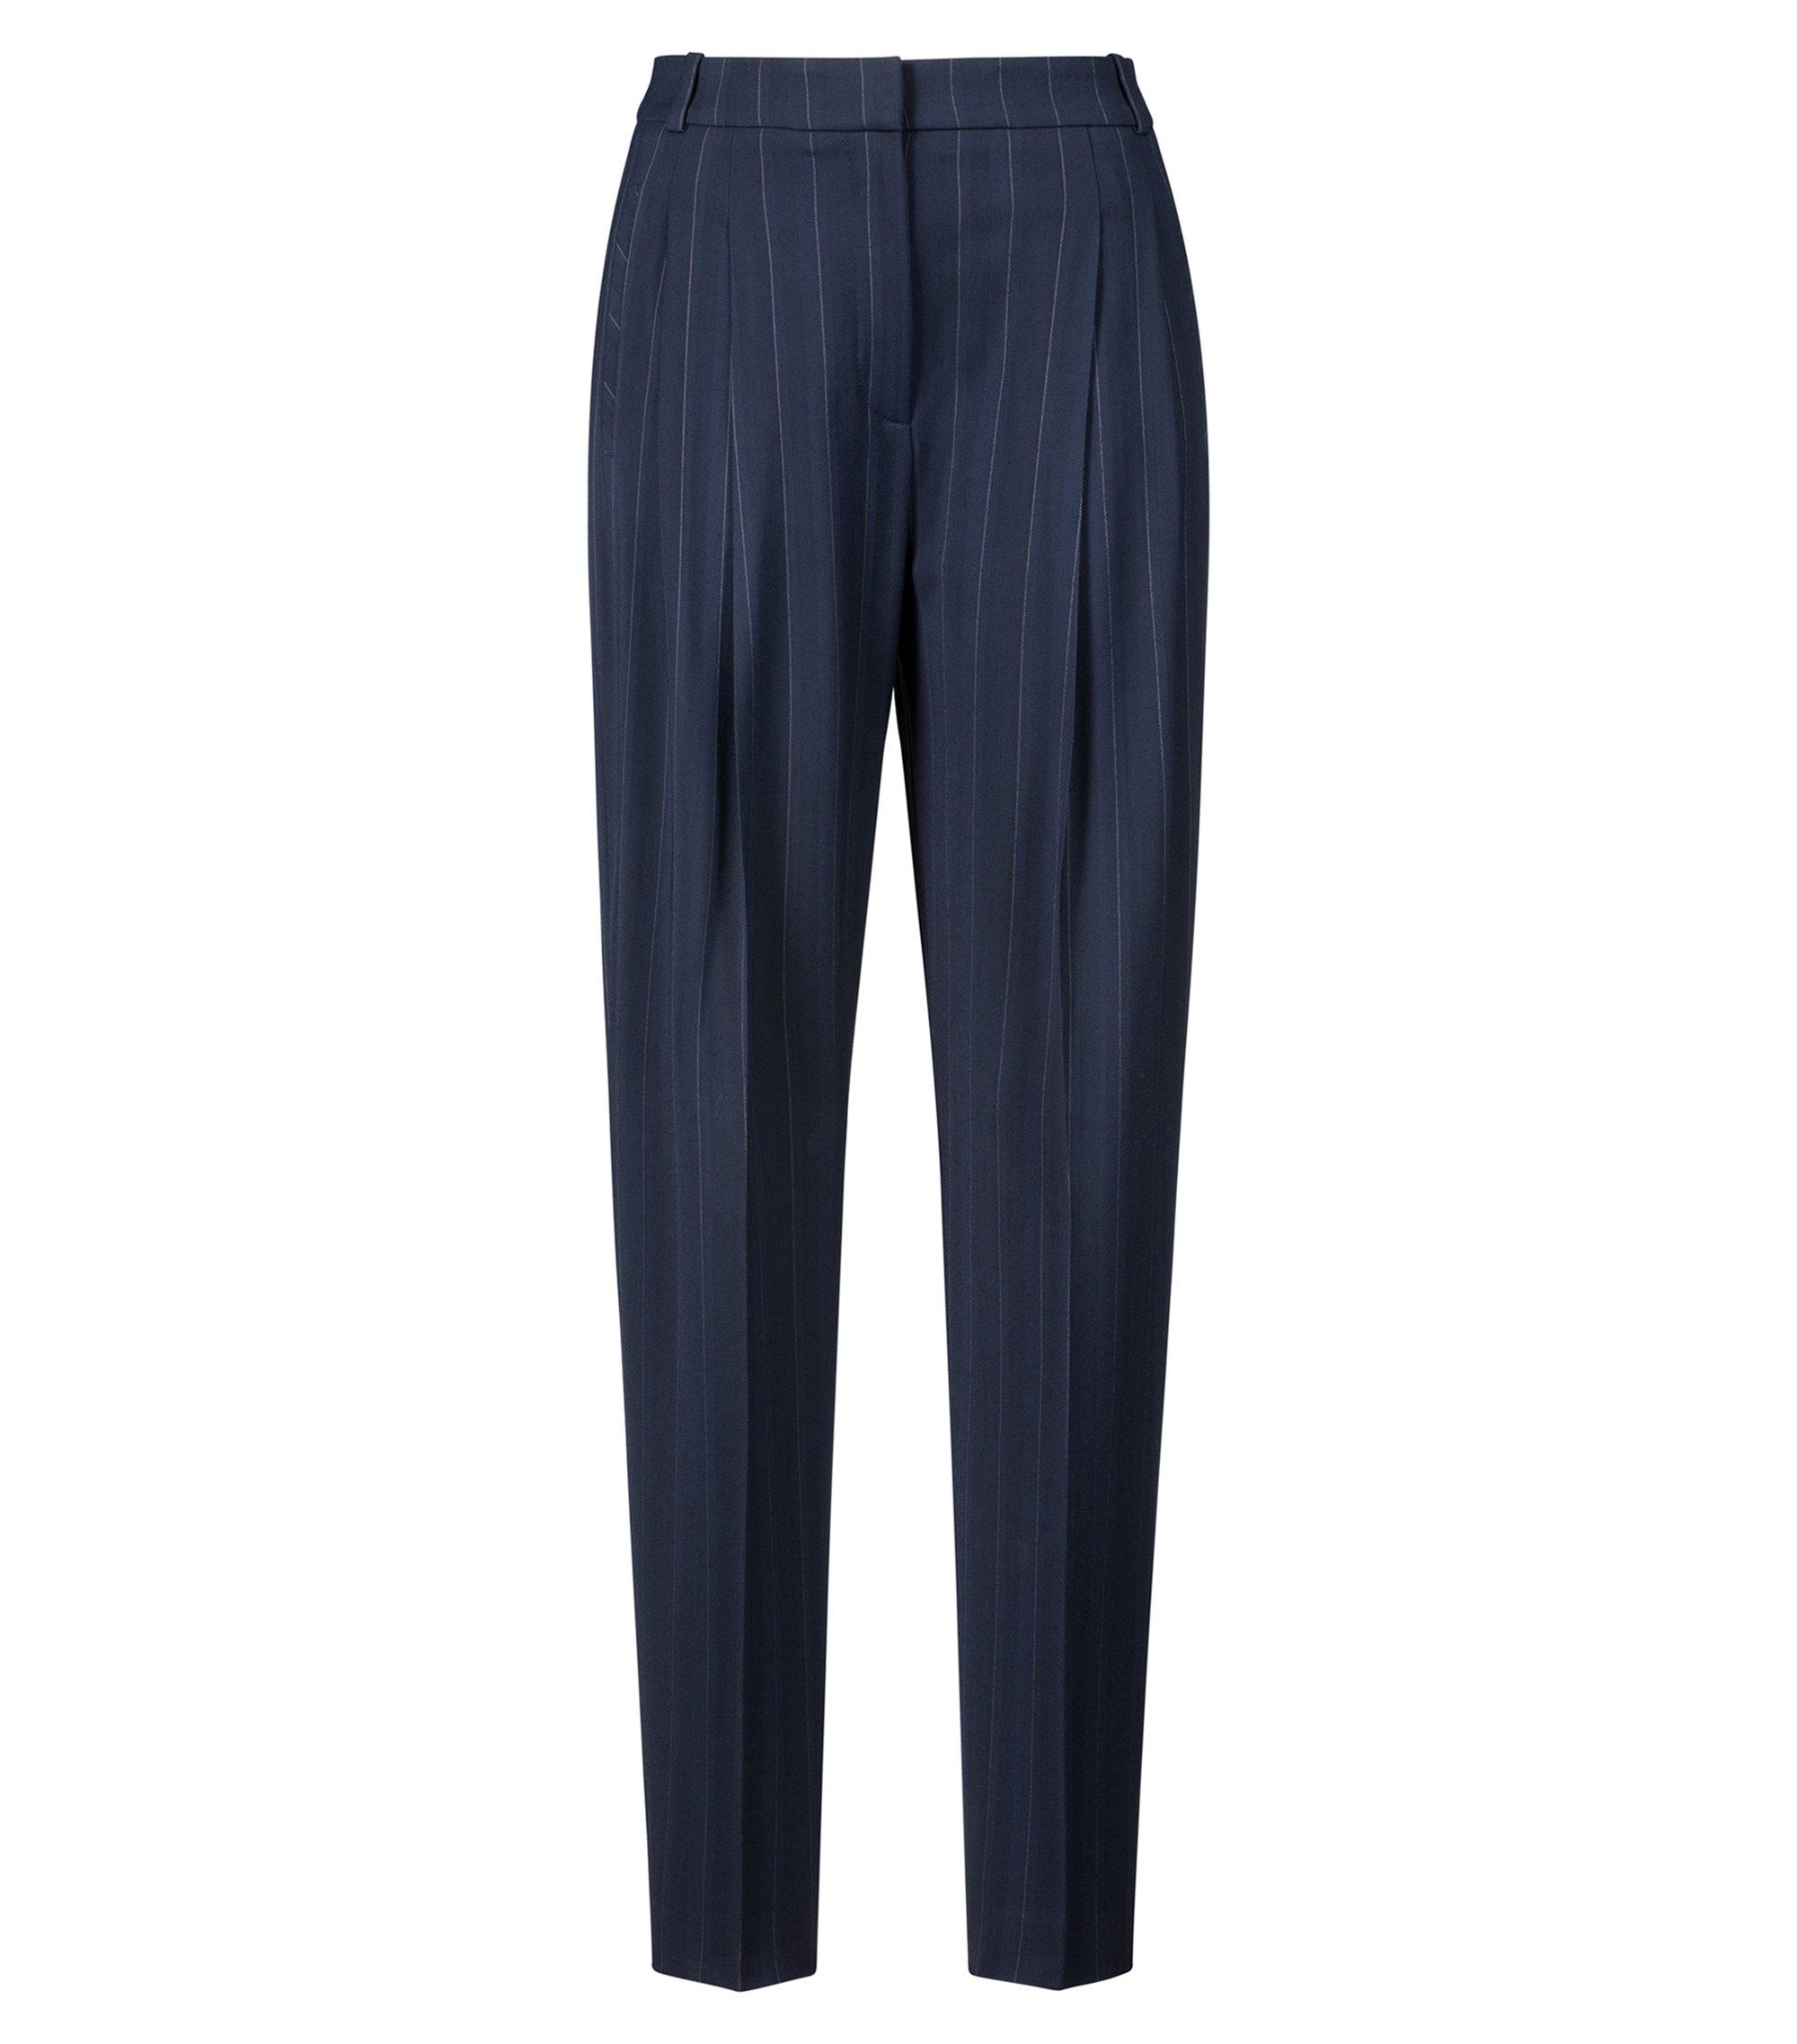 Tapered-fit broek van krijtstreepmateriaal met plooien en stretch, Donkerblauw